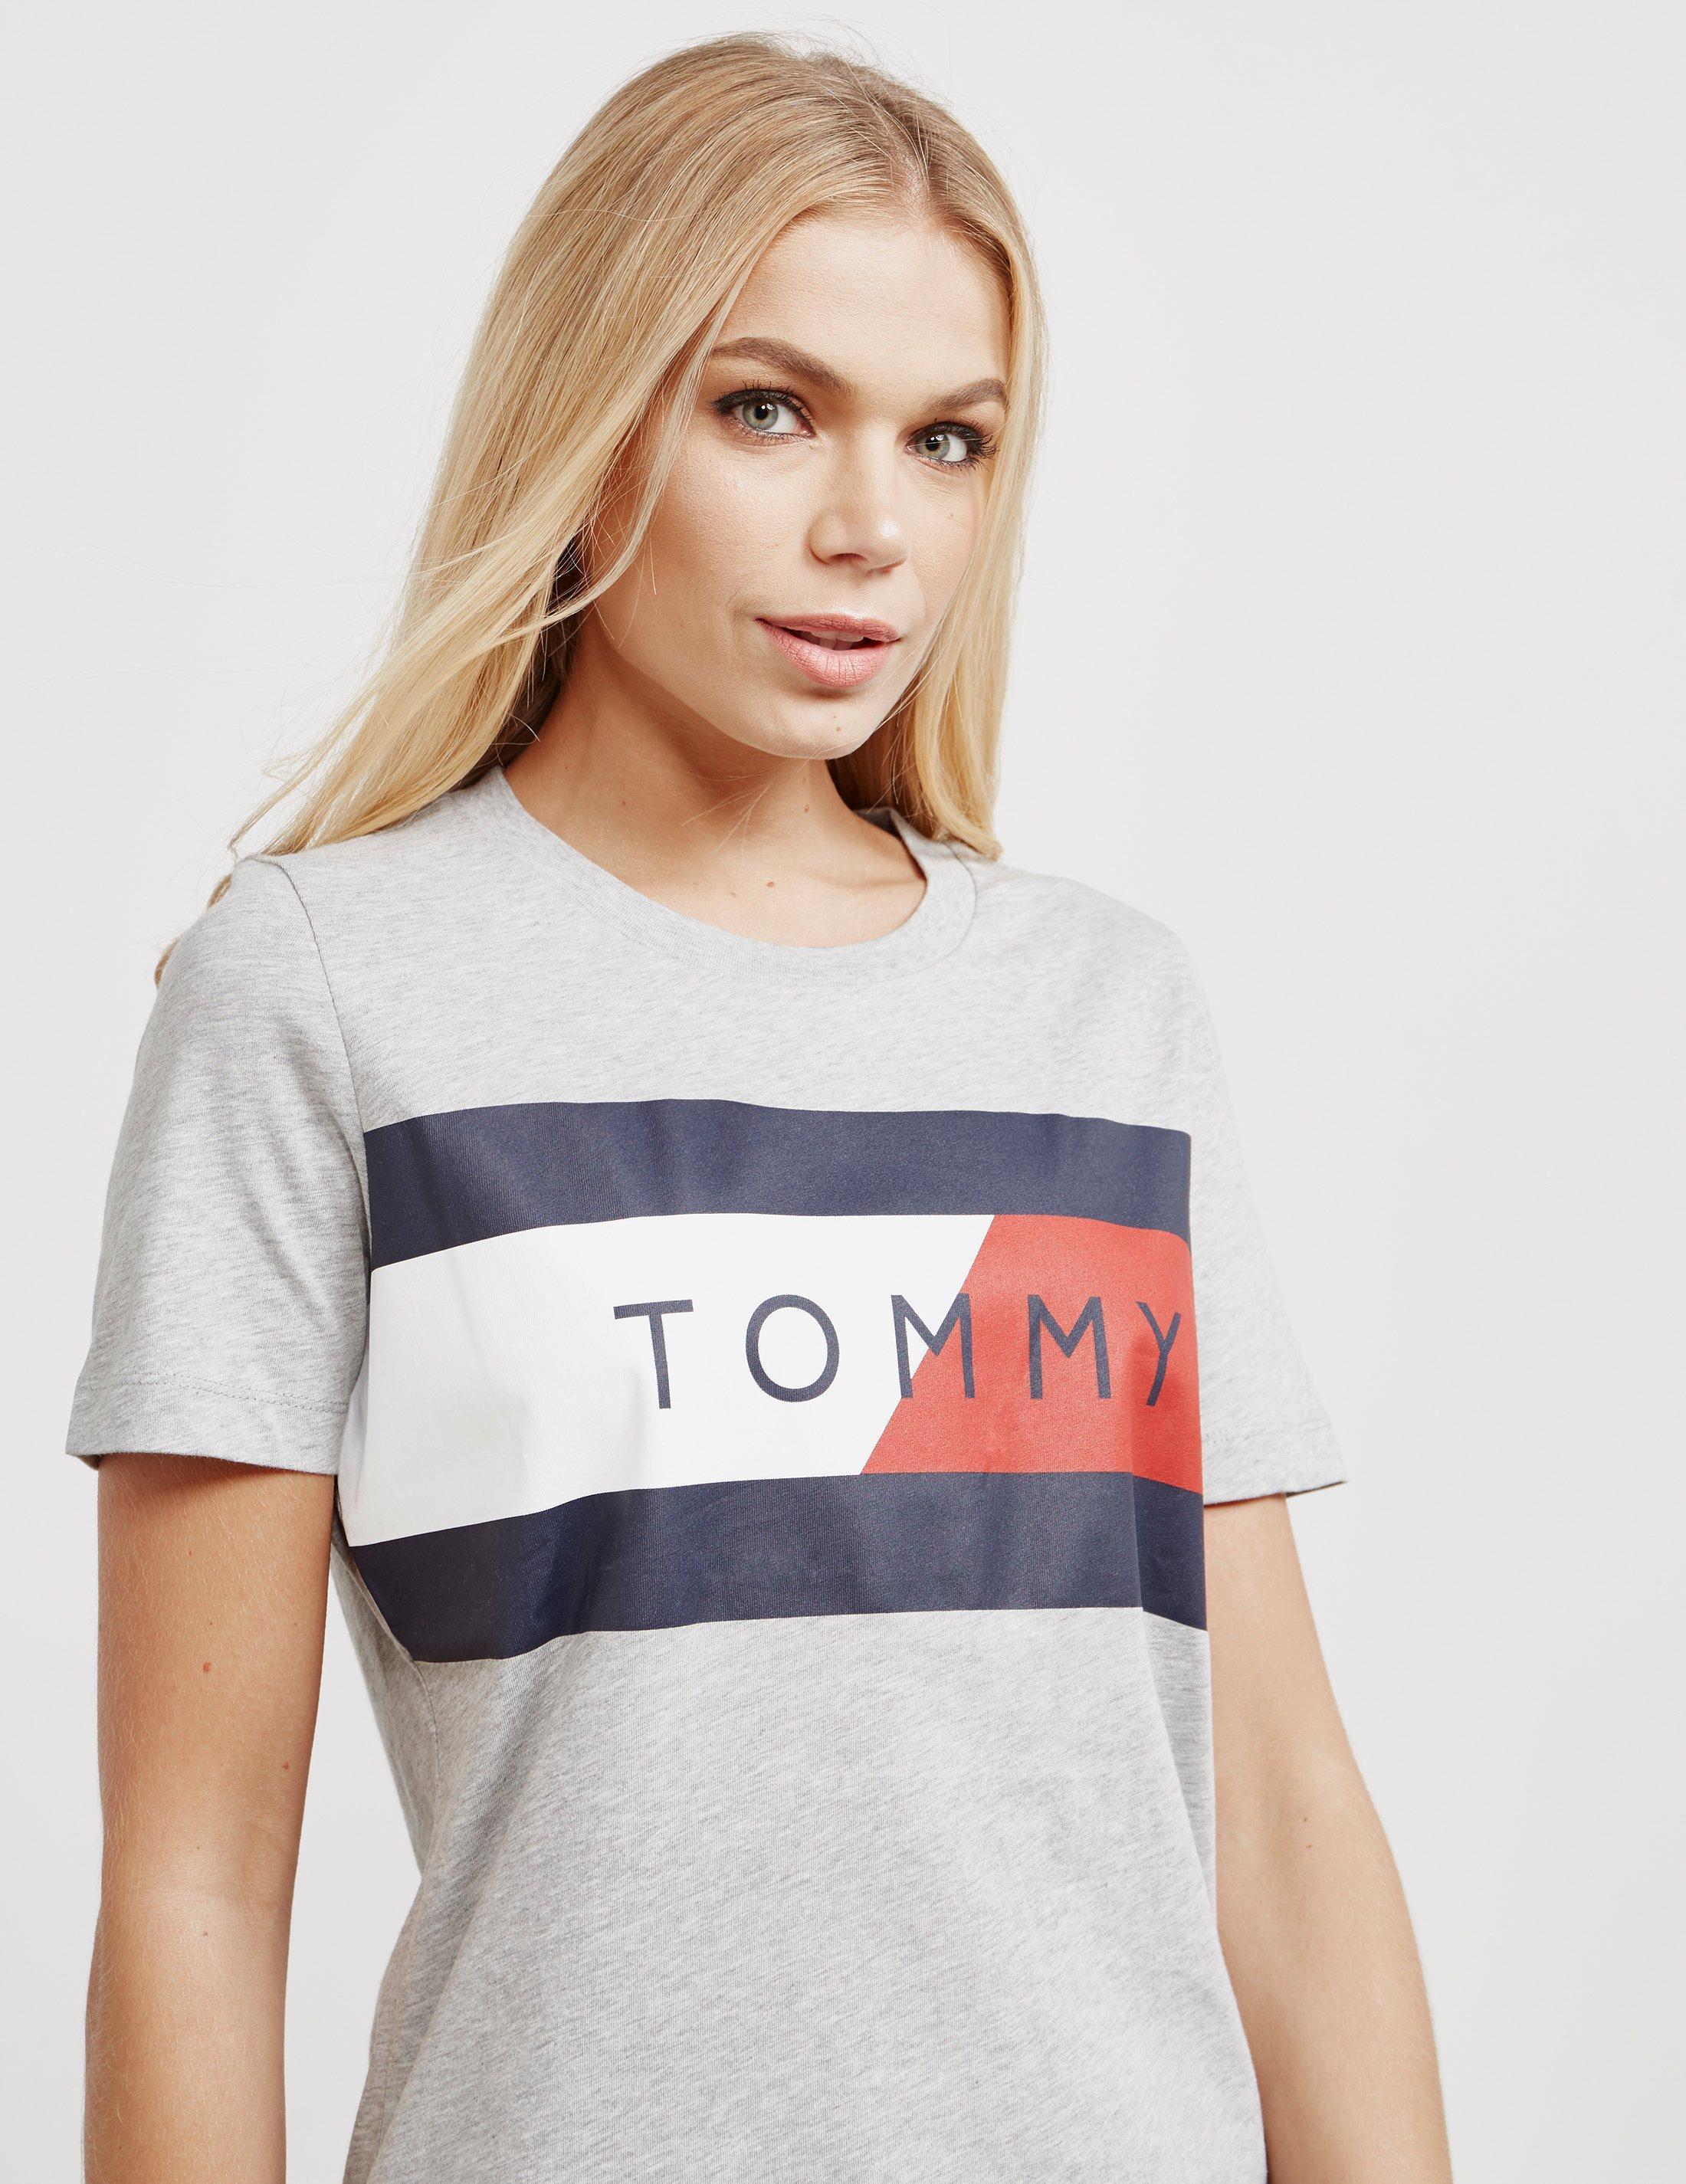 3cc6e94c55fe5 Tommy Hilfiger Womens Athletic Logo Flag Short Sleeve T-shirt Grey ...